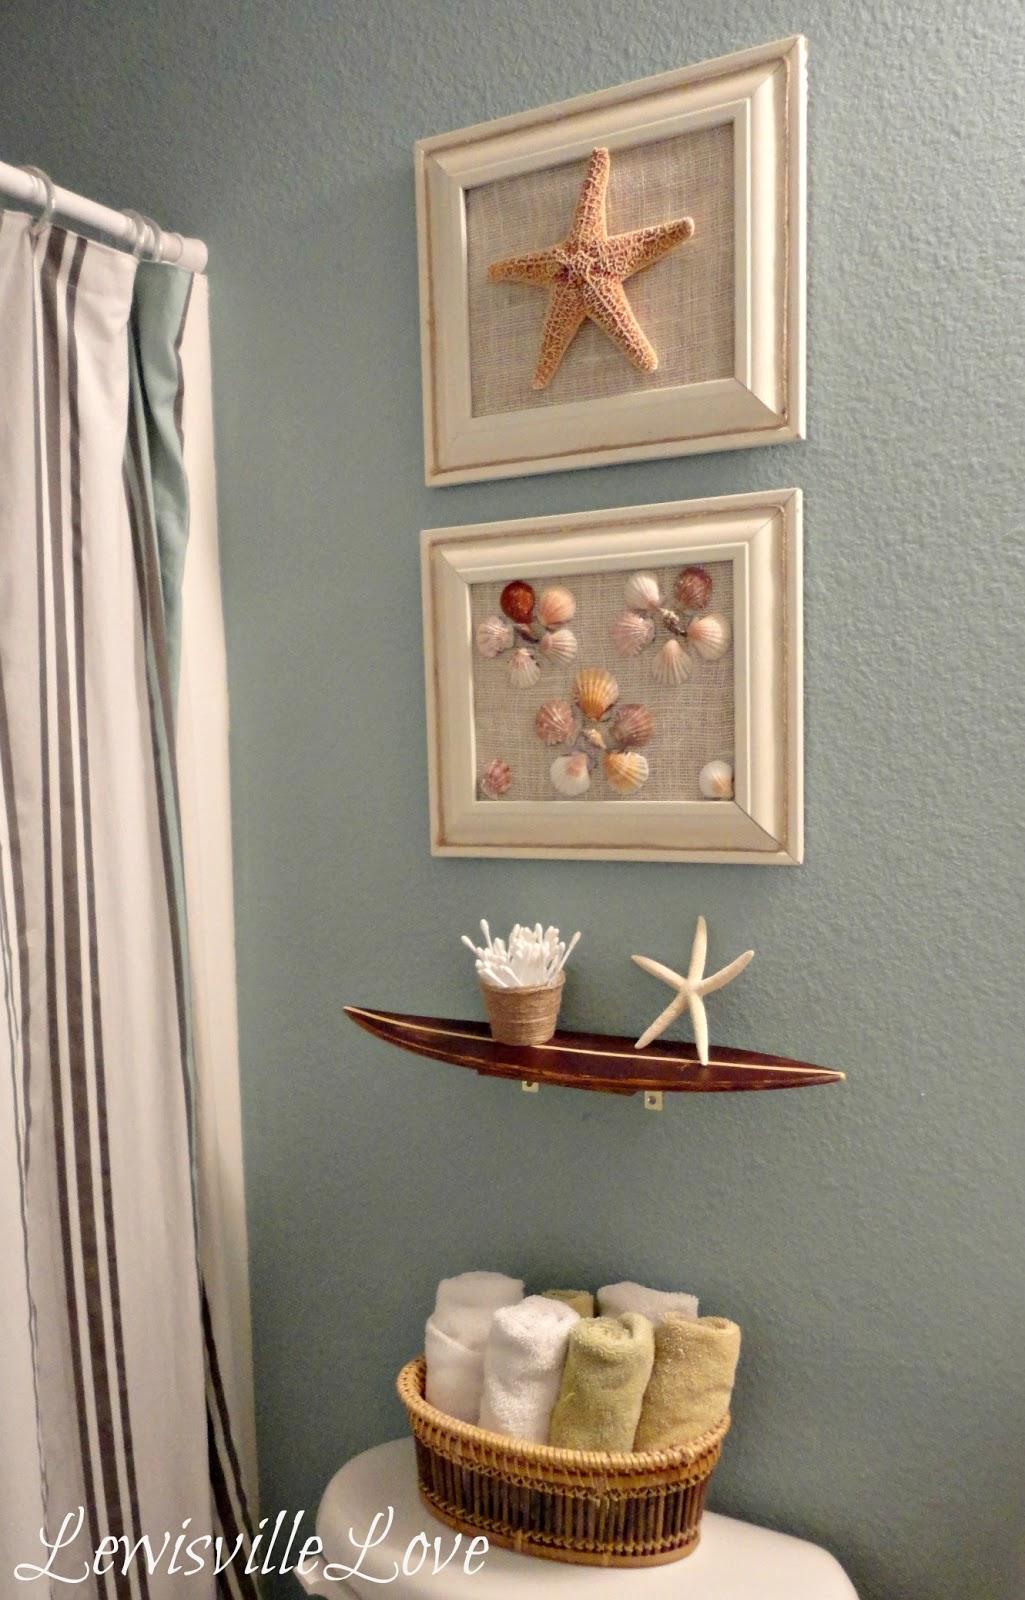 Lewisville Love: Beach Theme Bathroom Reveal